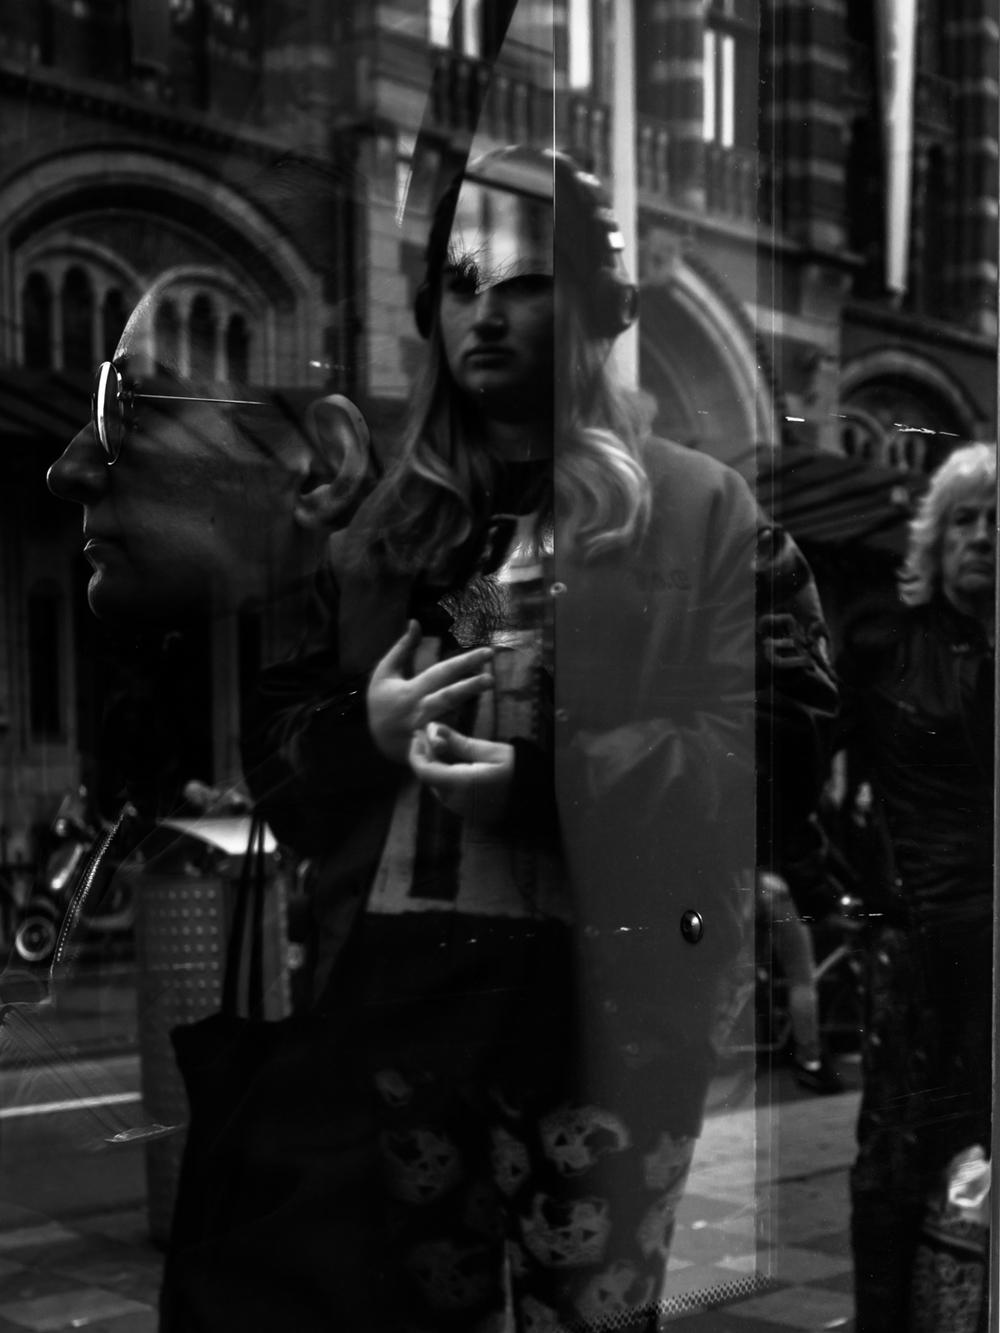 fokko muller street photography - 131019 - 001.jpg